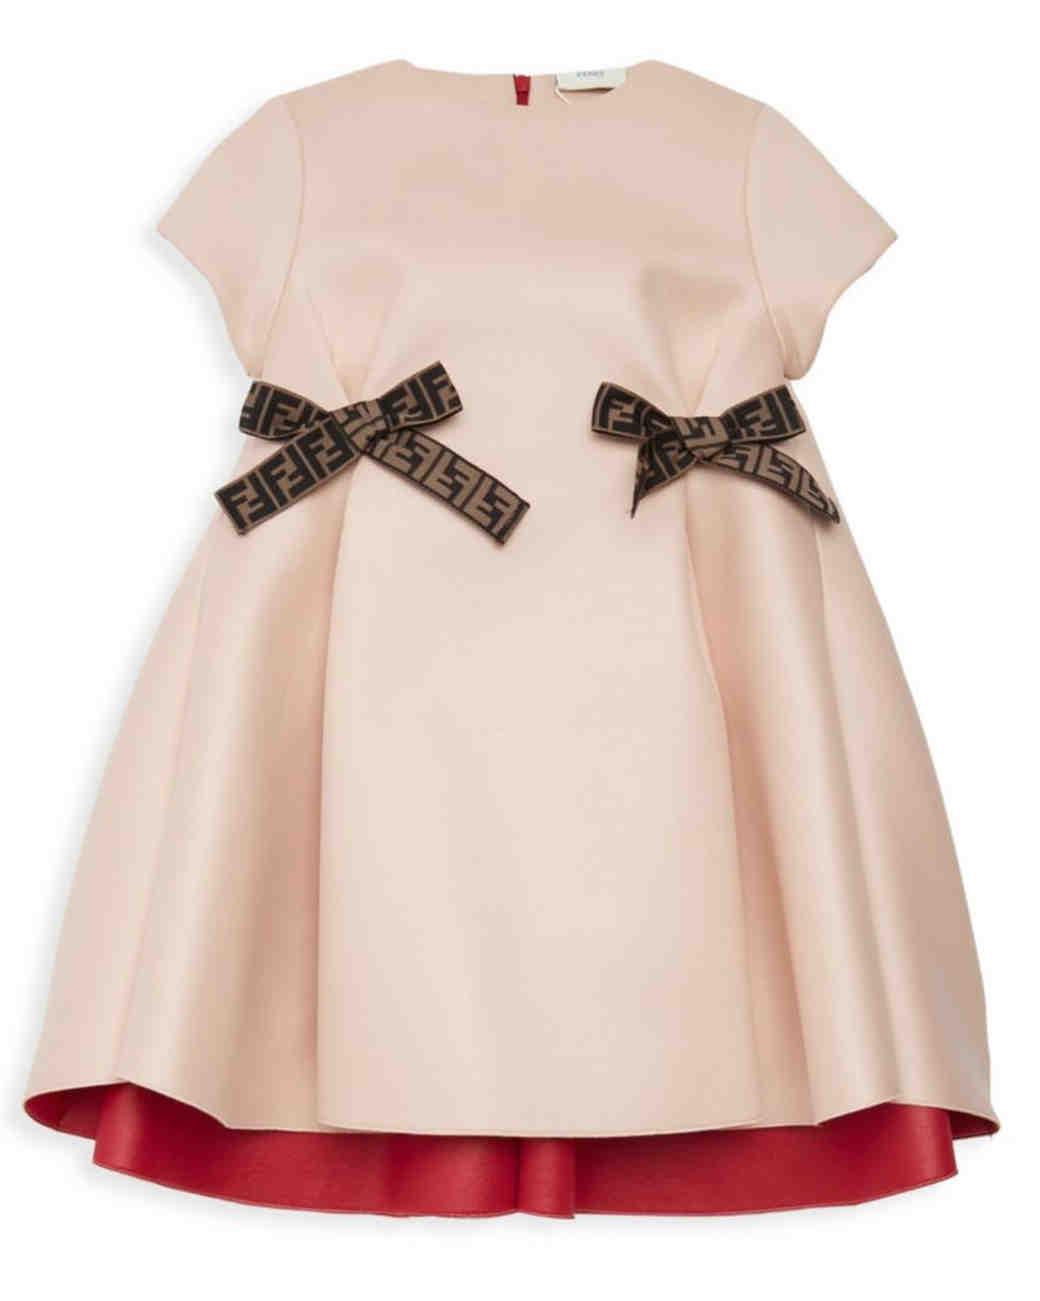 3ec18aa6103c08 The Most Adorable Flower Girl Dresses for a Winter Wedding | Martha Stewart  Weddings